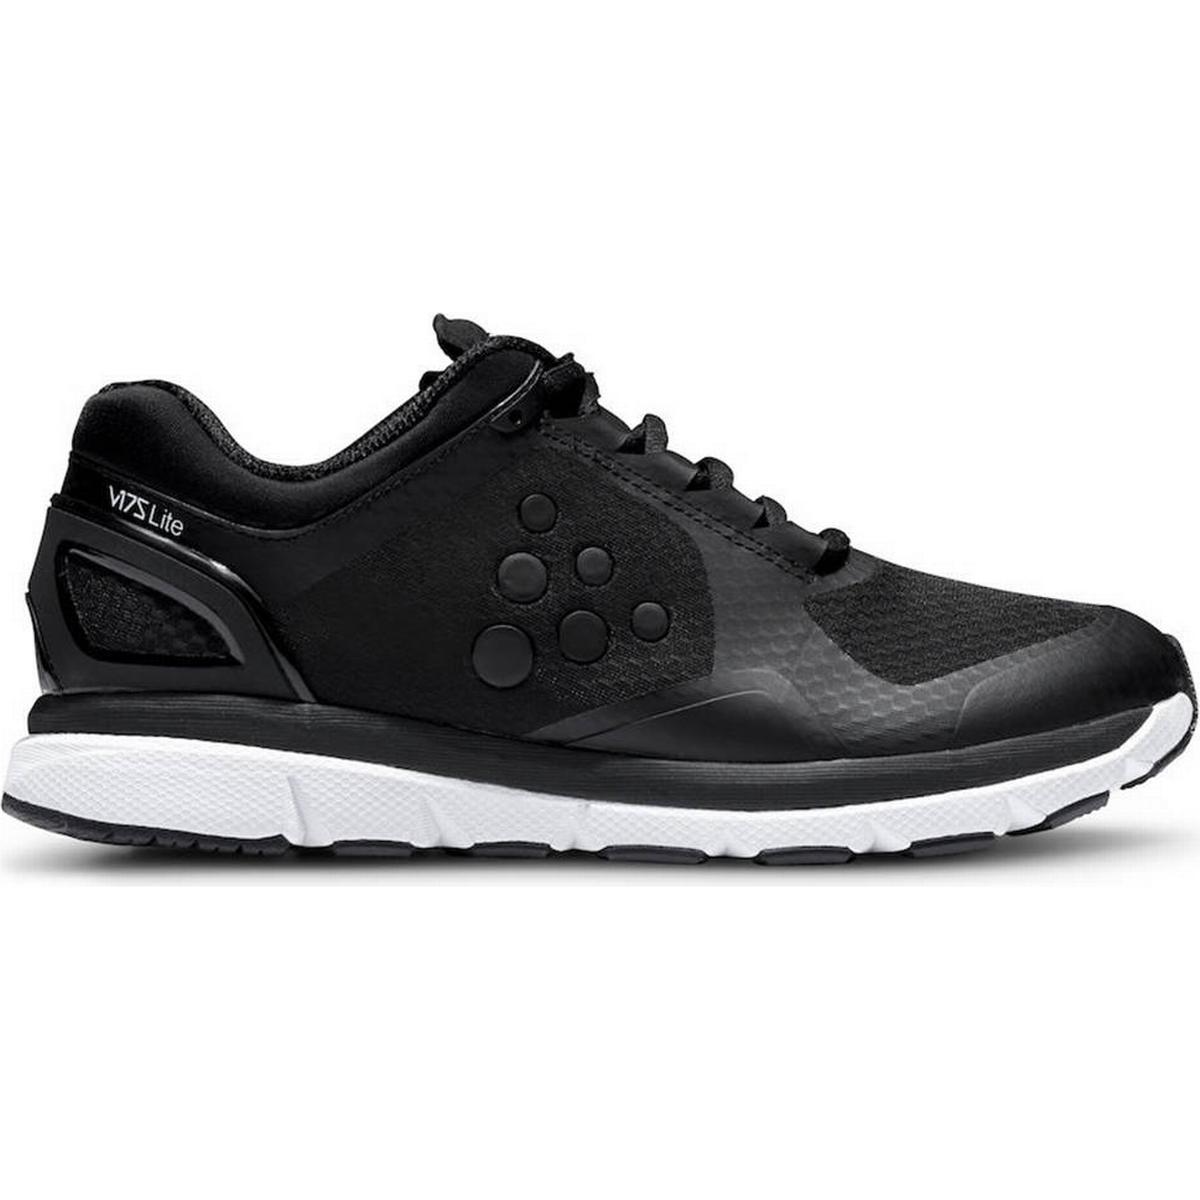 Puma shoes for Men – Designed to Enhance Your Speed